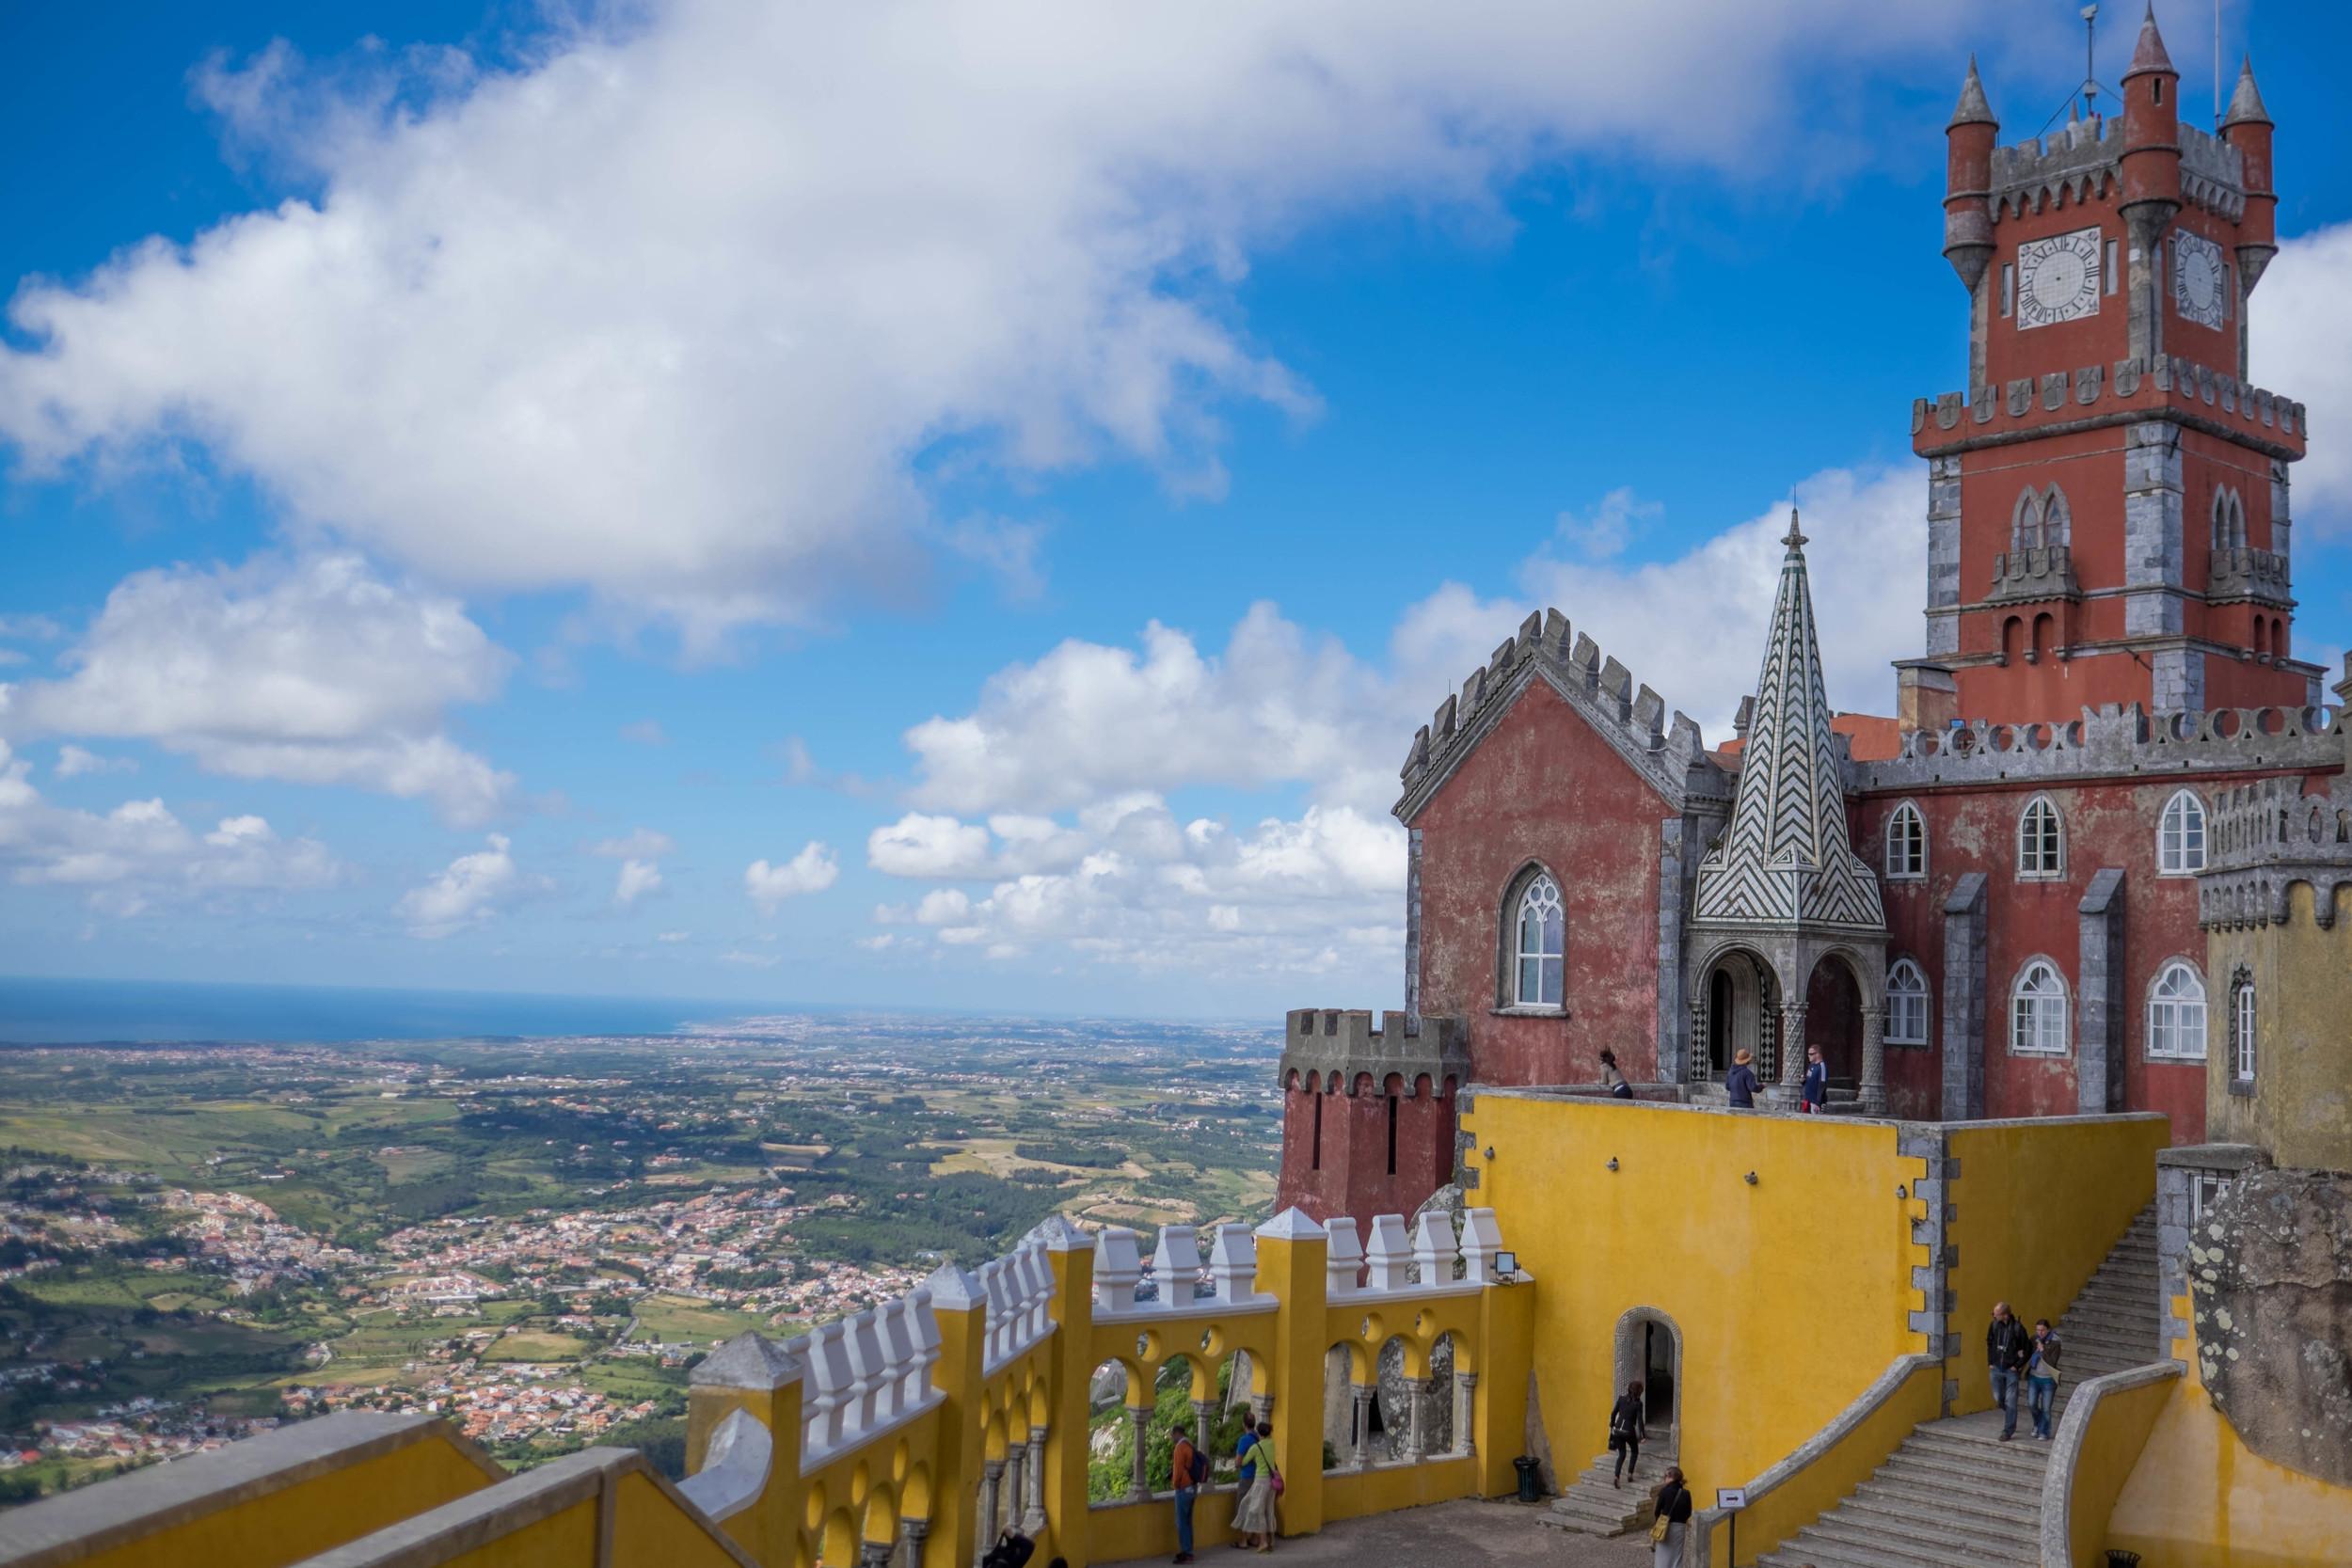 Kristen_Humbert_Philadelpia_Photographer_Travel_Editorial_Portugal-3540.jpg